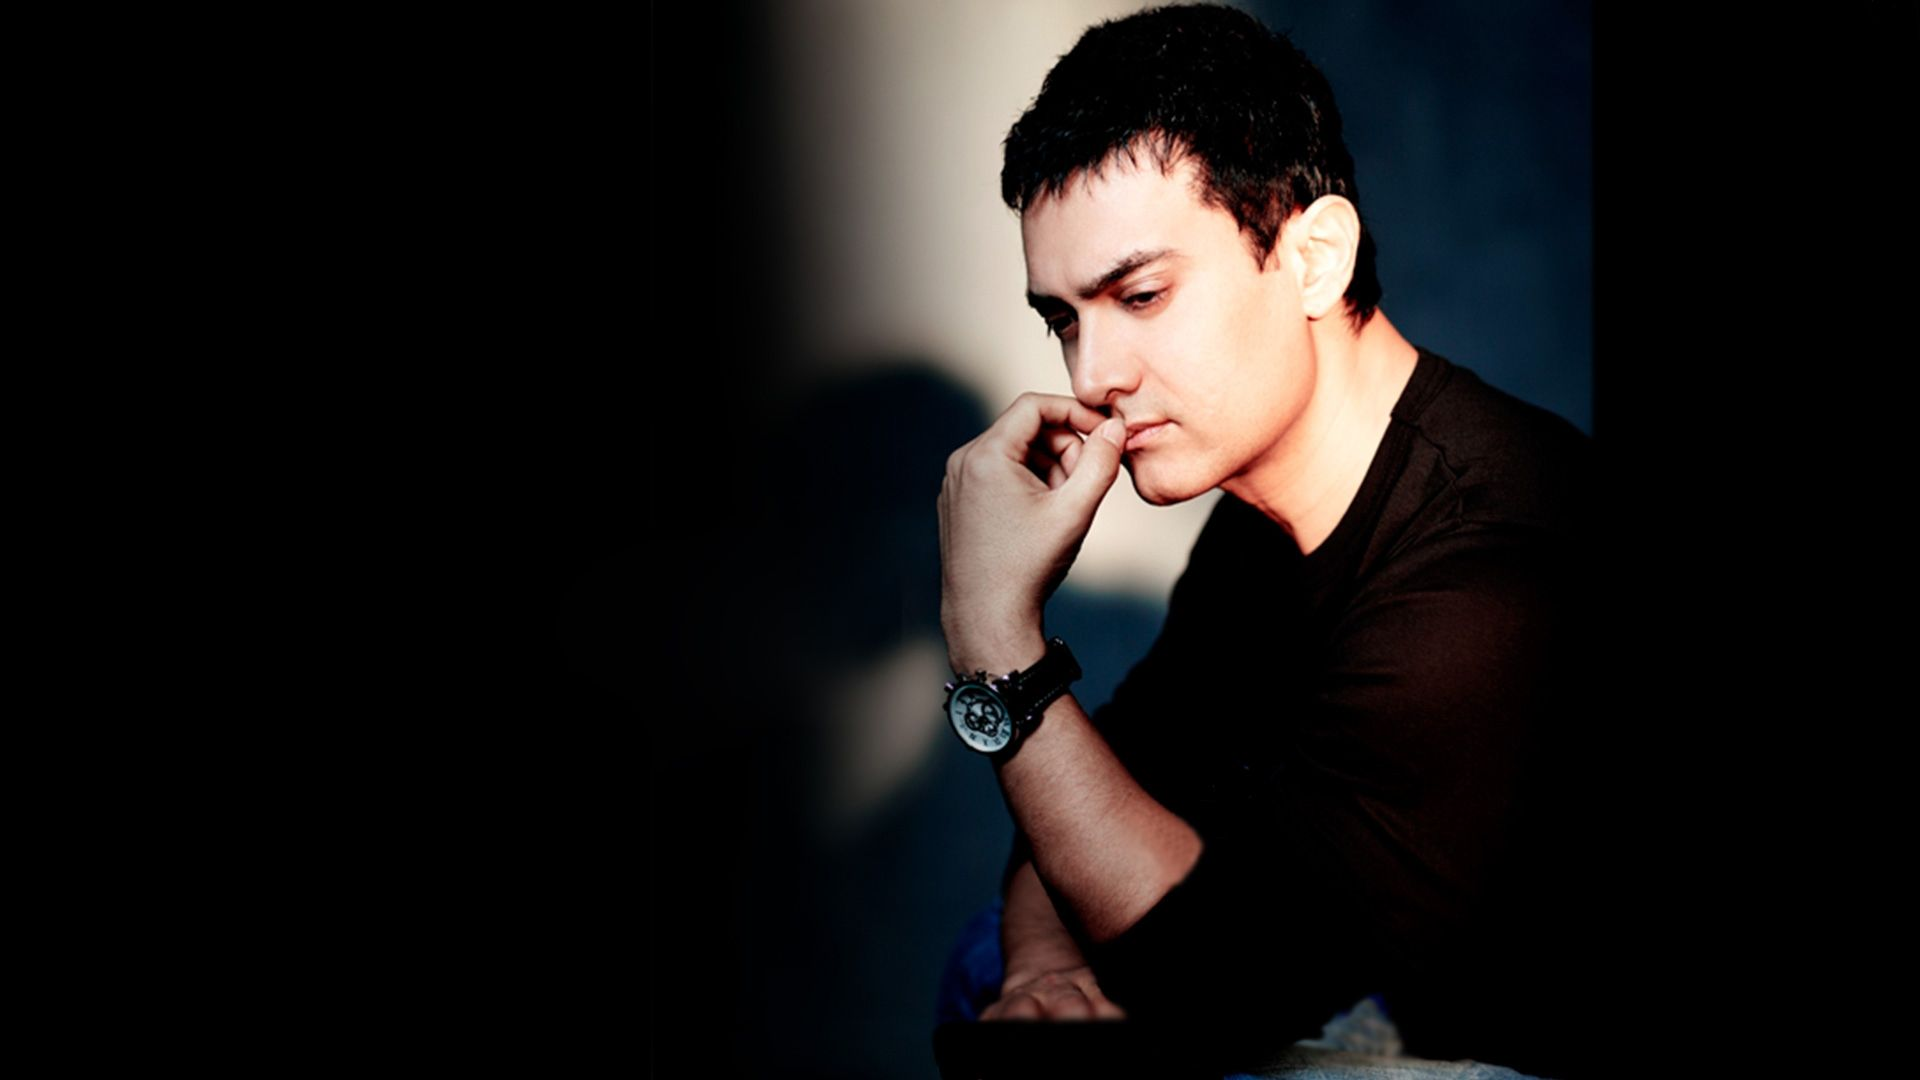 Actor Aamir Khan Wallpapers full HD 1080p Wallpapers in 2019 1920x1080